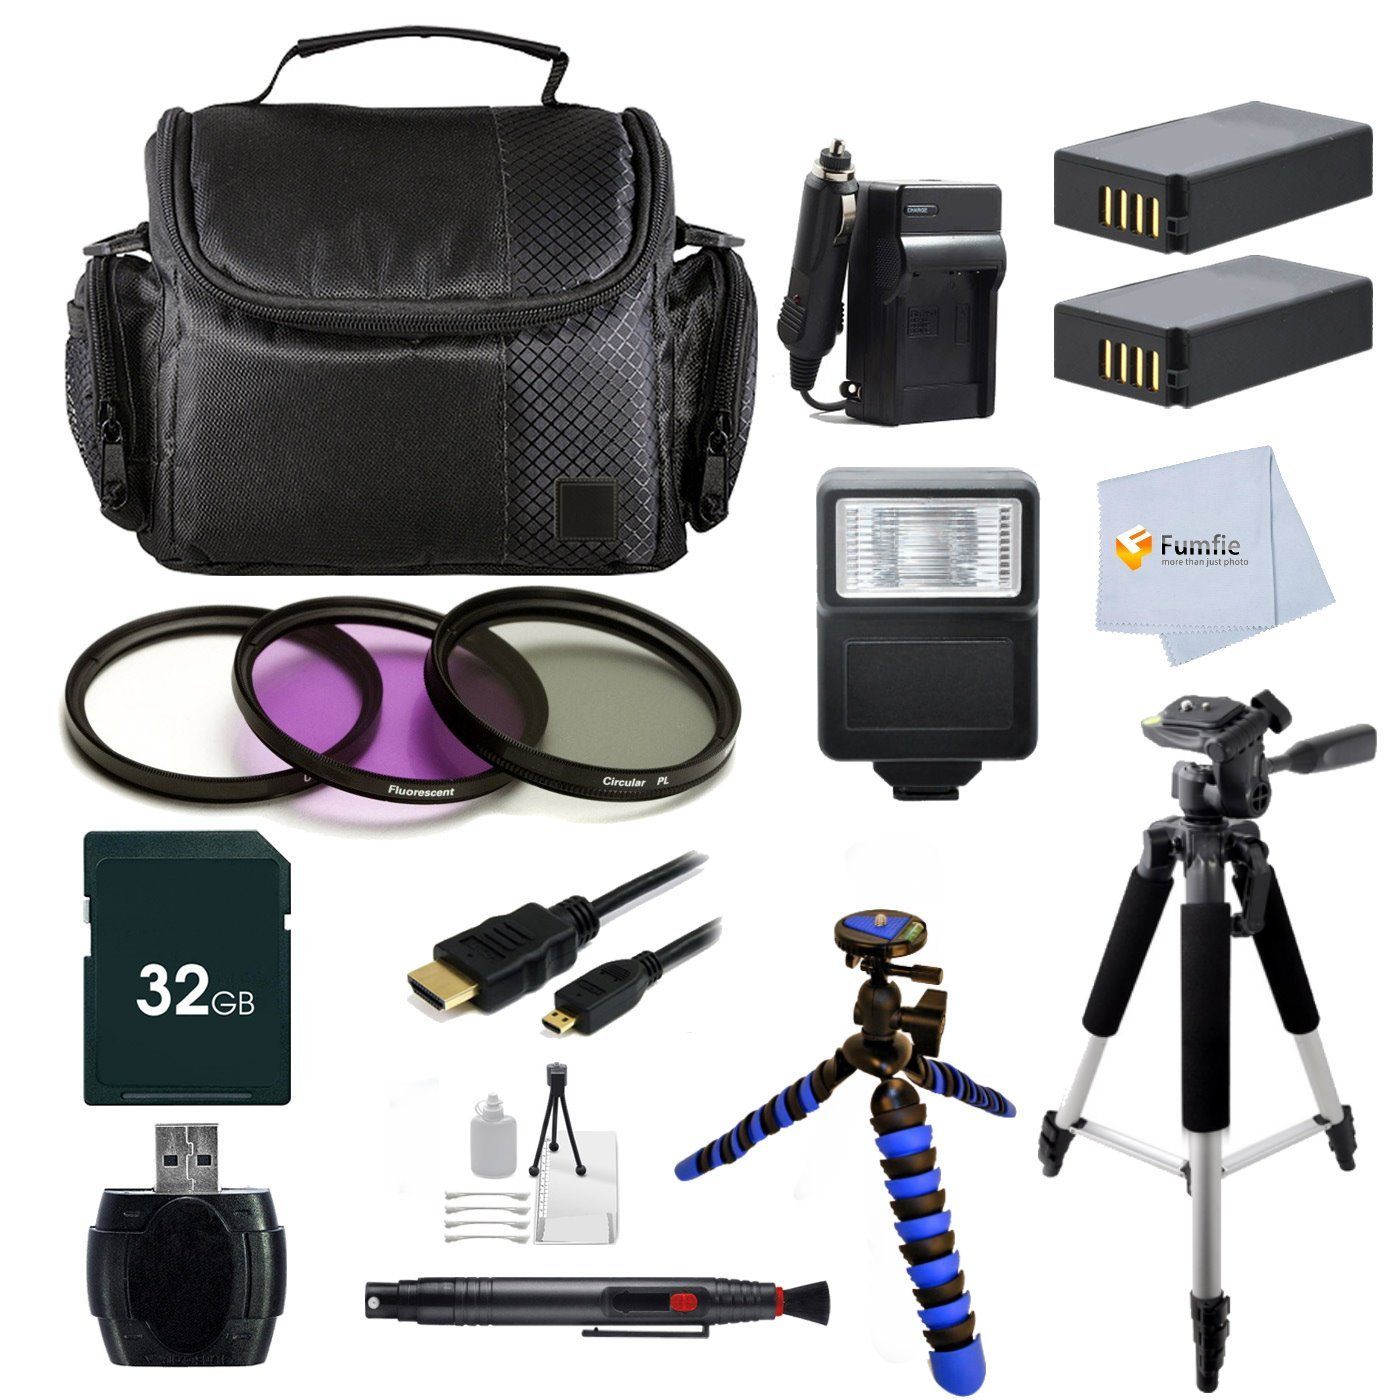 Advanced Accessory Kit for Nikon COOLPIX P900 Digital Camera Includes: 32GB Memory Card + 2 Batteries + 57' Tripod & more Fumfie